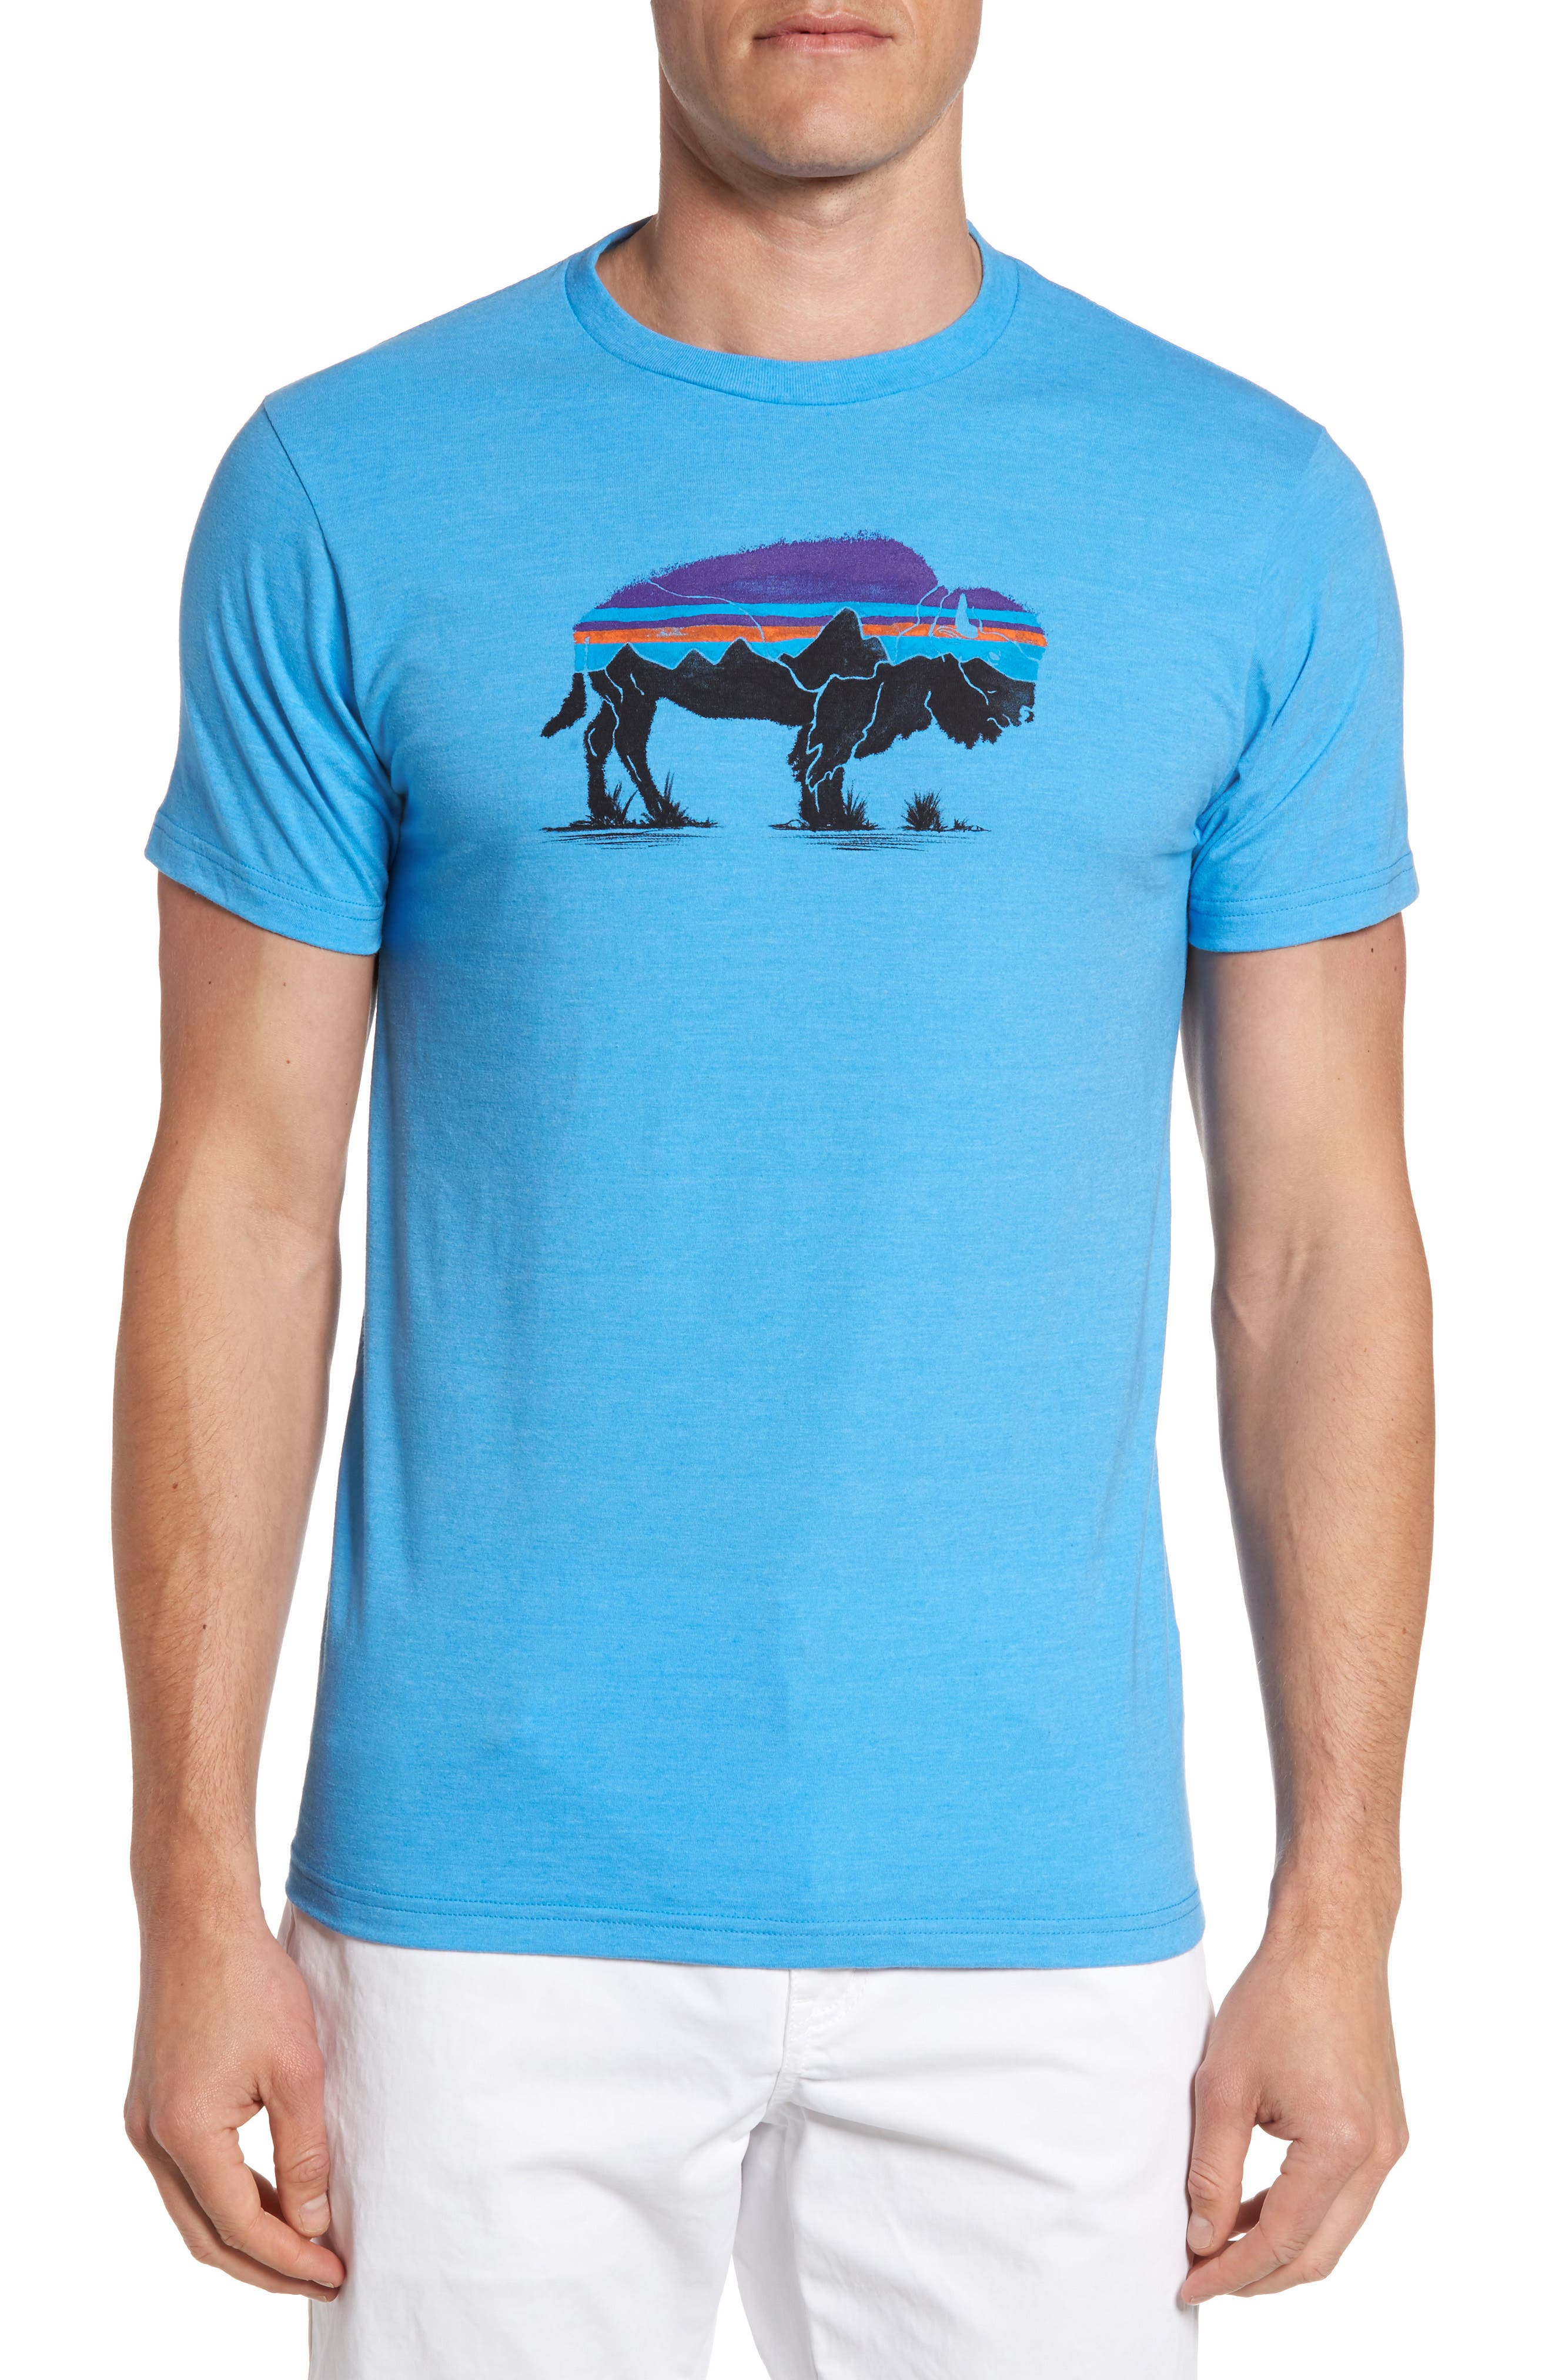 Alternate Image 1 Selected - Patagonia Fitz Roy Bison T-Shirt